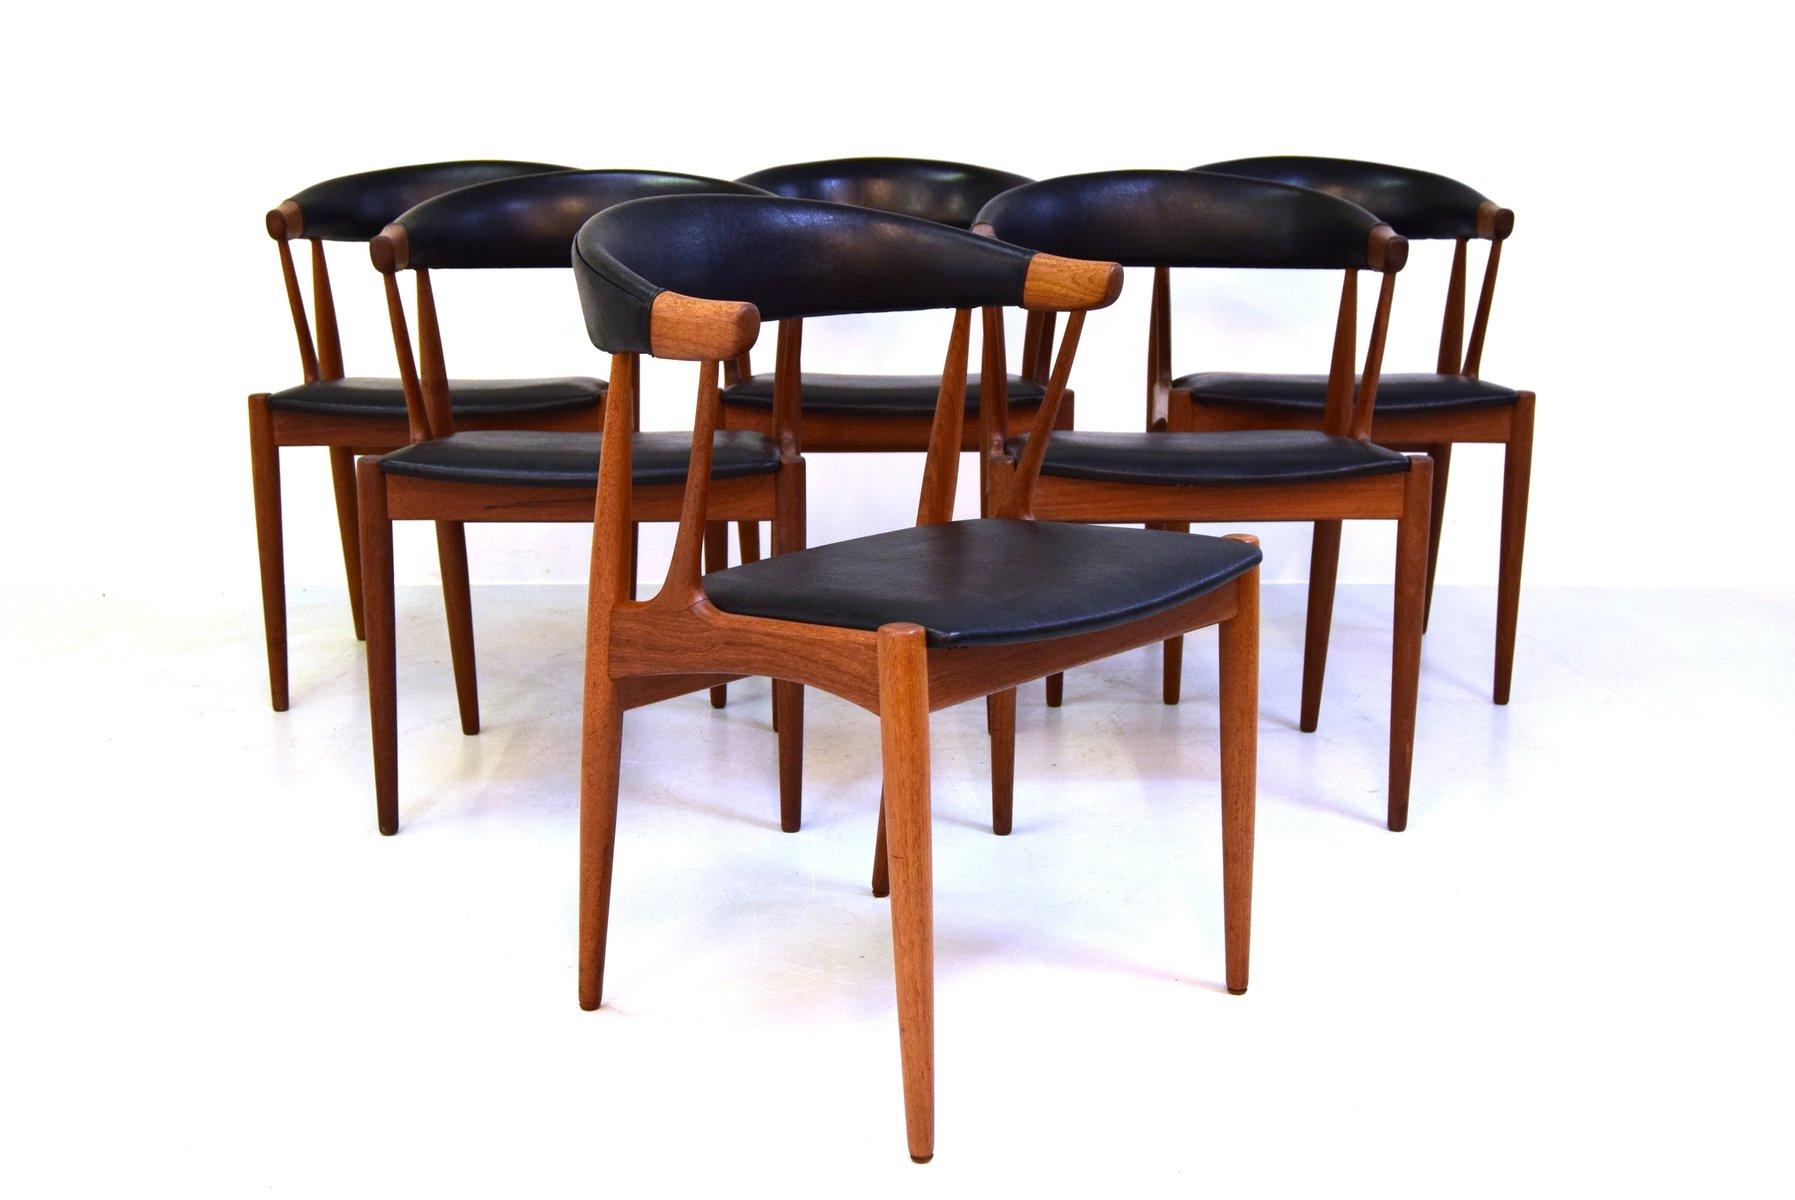 Model BA 113 Dining Chairs By Brdr Johannes Andersen For Andersens Mbelfabrik Set Of 6